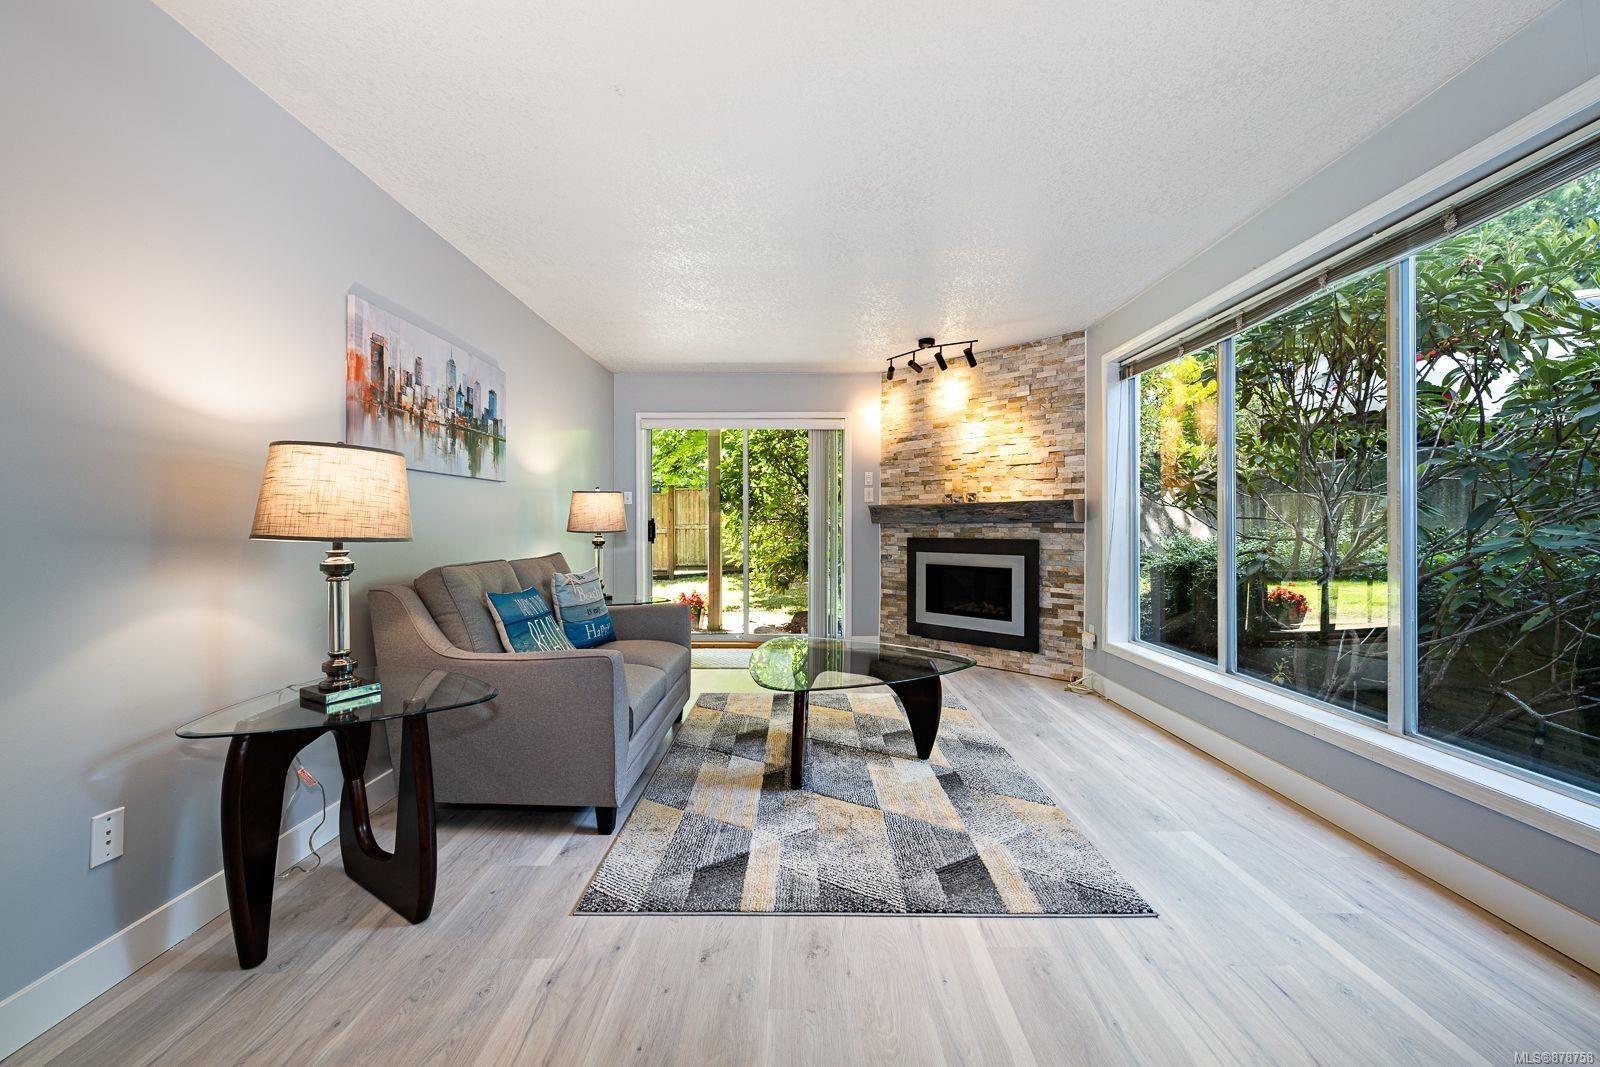 Main Photo: 214 4693 Muir Rd in : CV Courtenay East Condo for sale (Comox Valley)  : MLS®# 878758